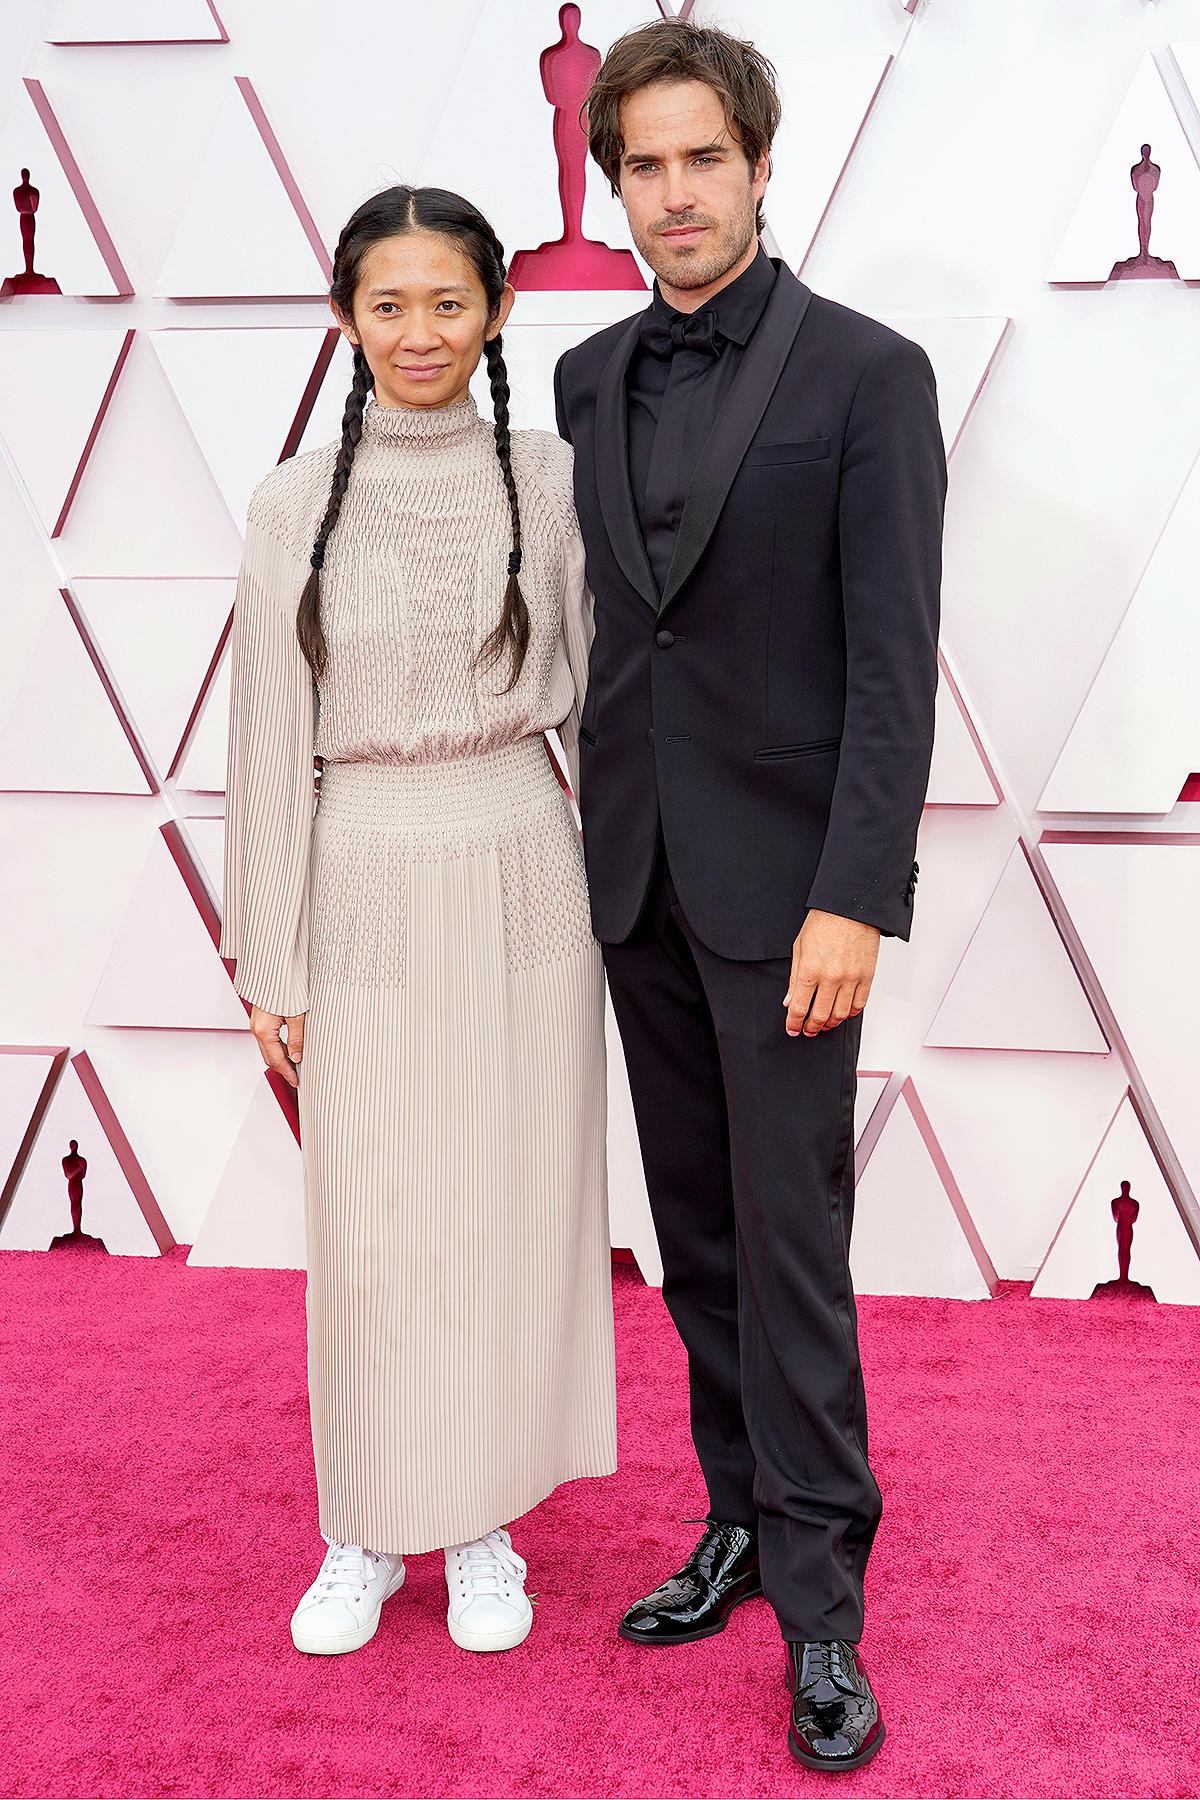 Nomadland Director Chloé Zhao Attends Oscars with Film's Cinematographer Joshua James Richards